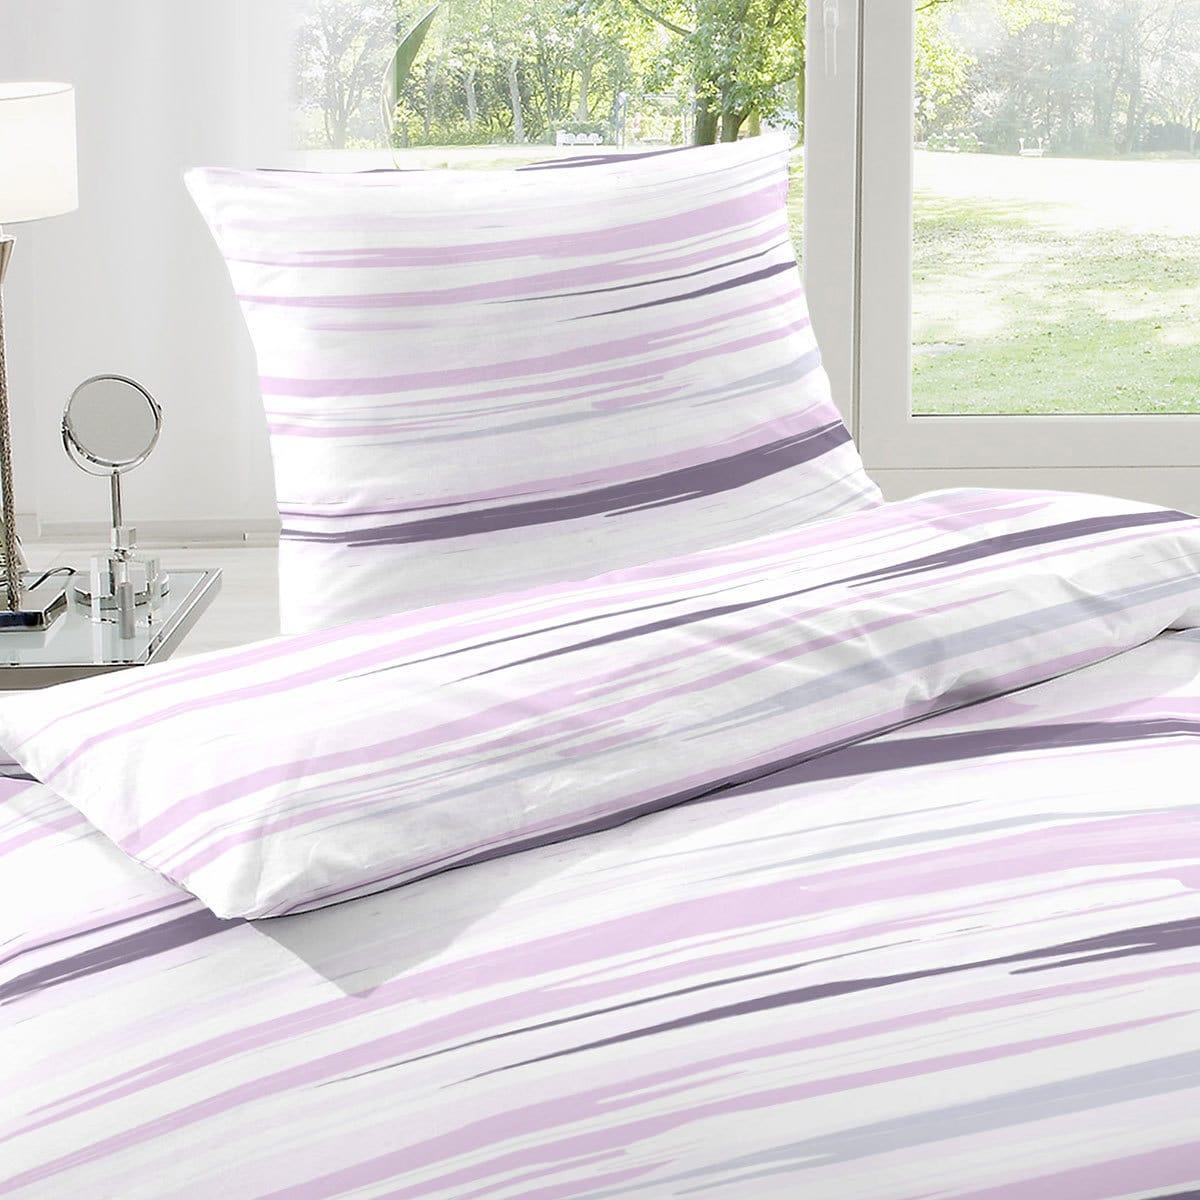 enrico coss baumwoll seersucker bettw sche streifen lila g nstig online kaufen bei bettwaren shop. Black Bedroom Furniture Sets. Home Design Ideas